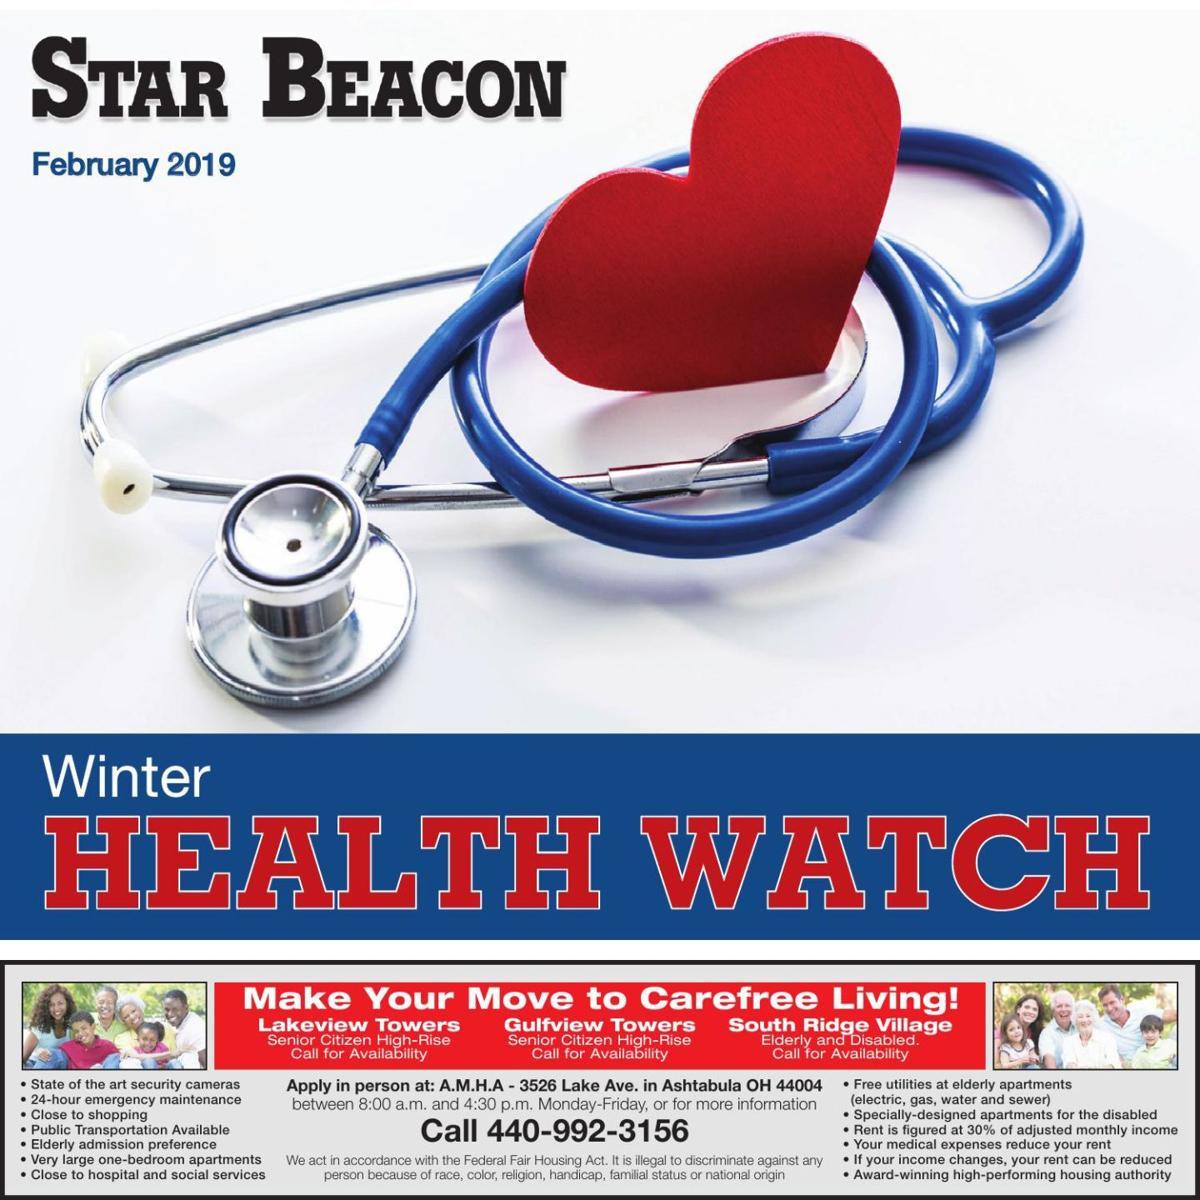 HEALTH WATCH 2019